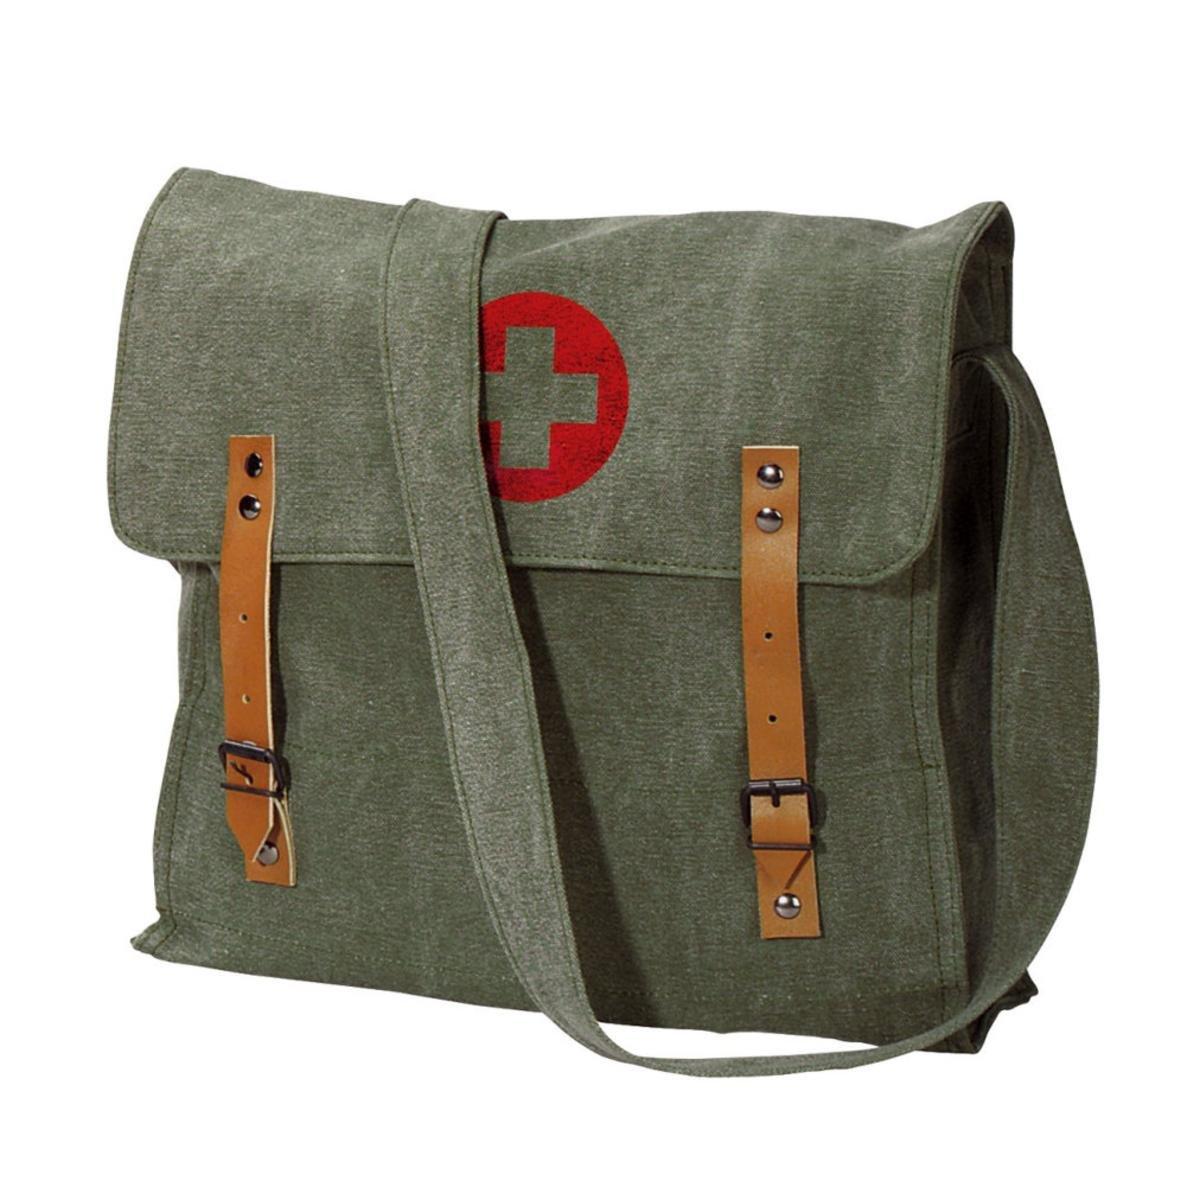 9141 Classic Medic Bag